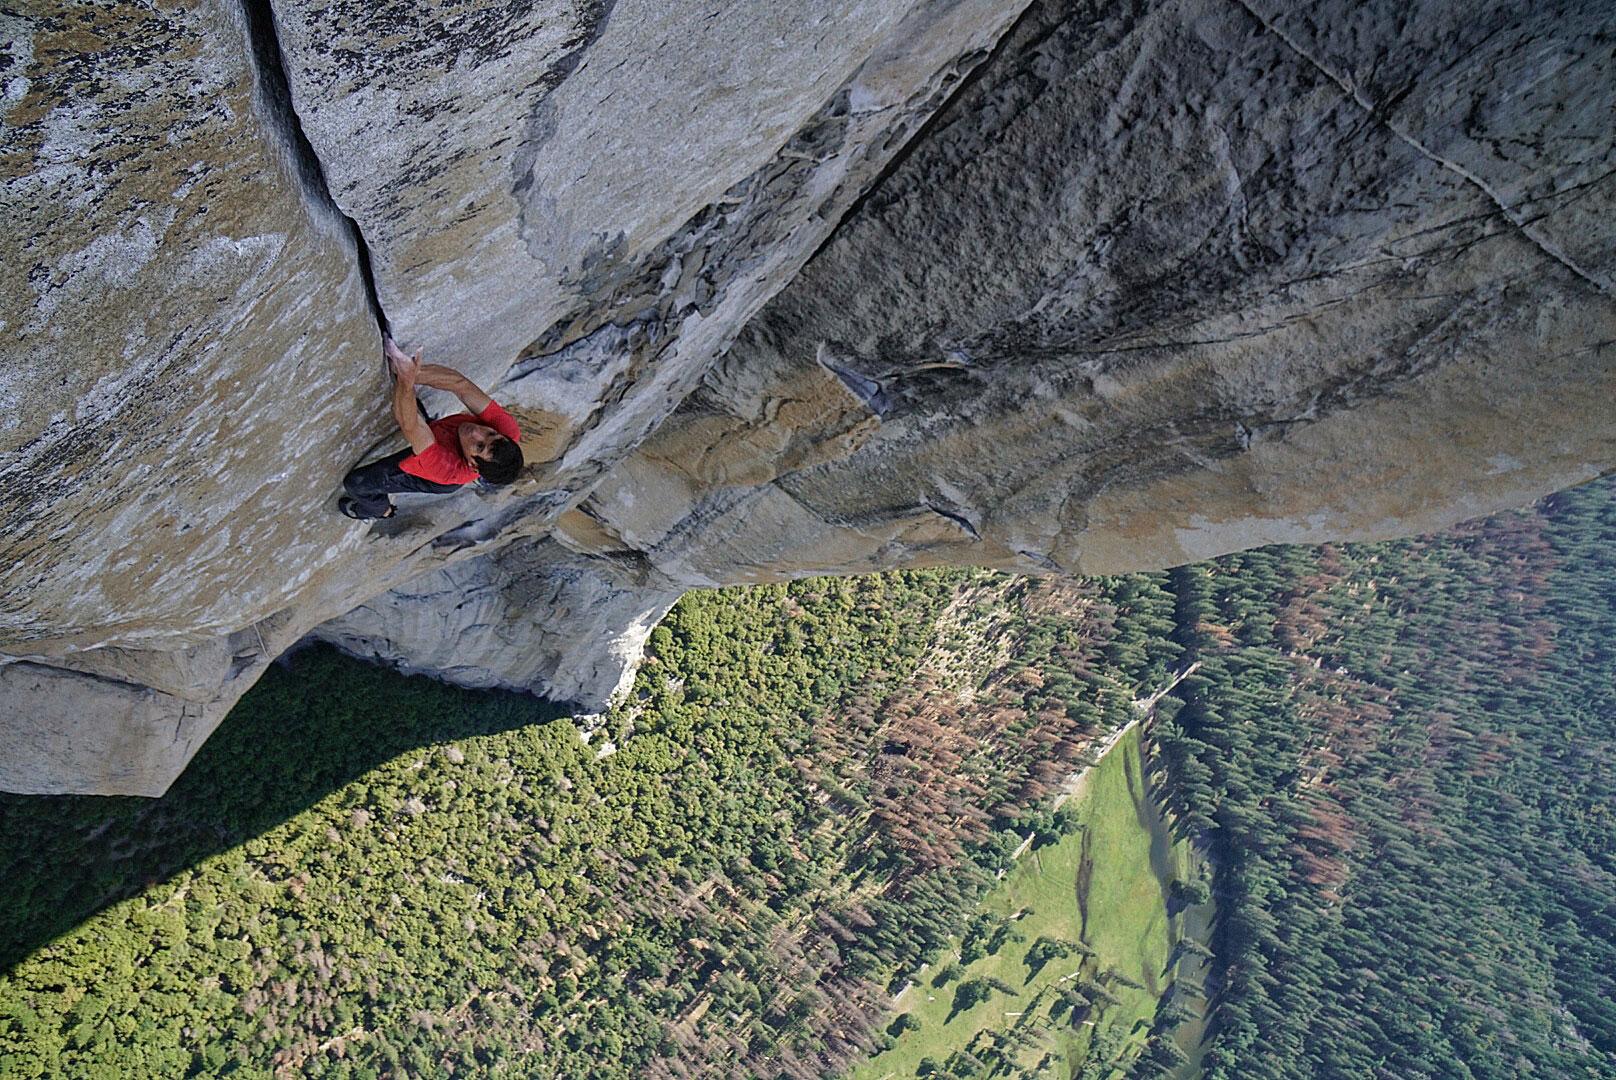 Climbing El Capitan in Yosemite National Park